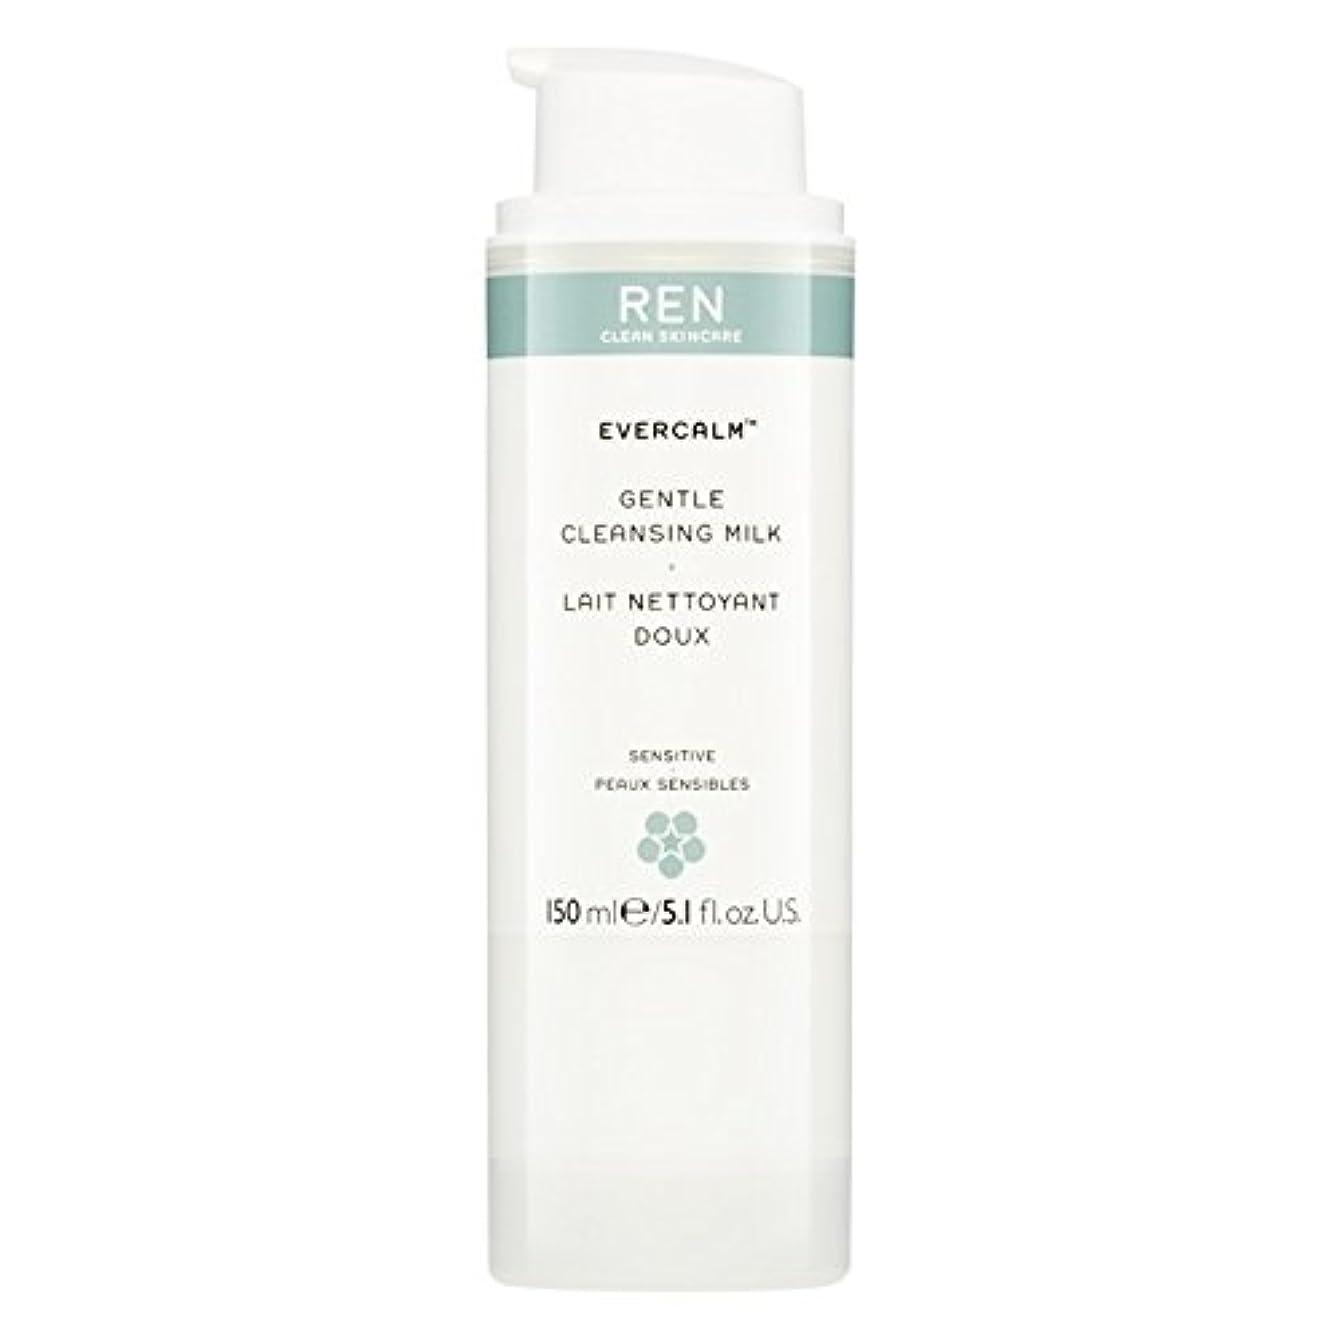 Ren Evercalm優しいクレンジングミルク、150ミリリットル (REN) (x6) - REN Evercalm Gentle Cleansing Milk, 150ml (Pack of 6) [並行輸入品]